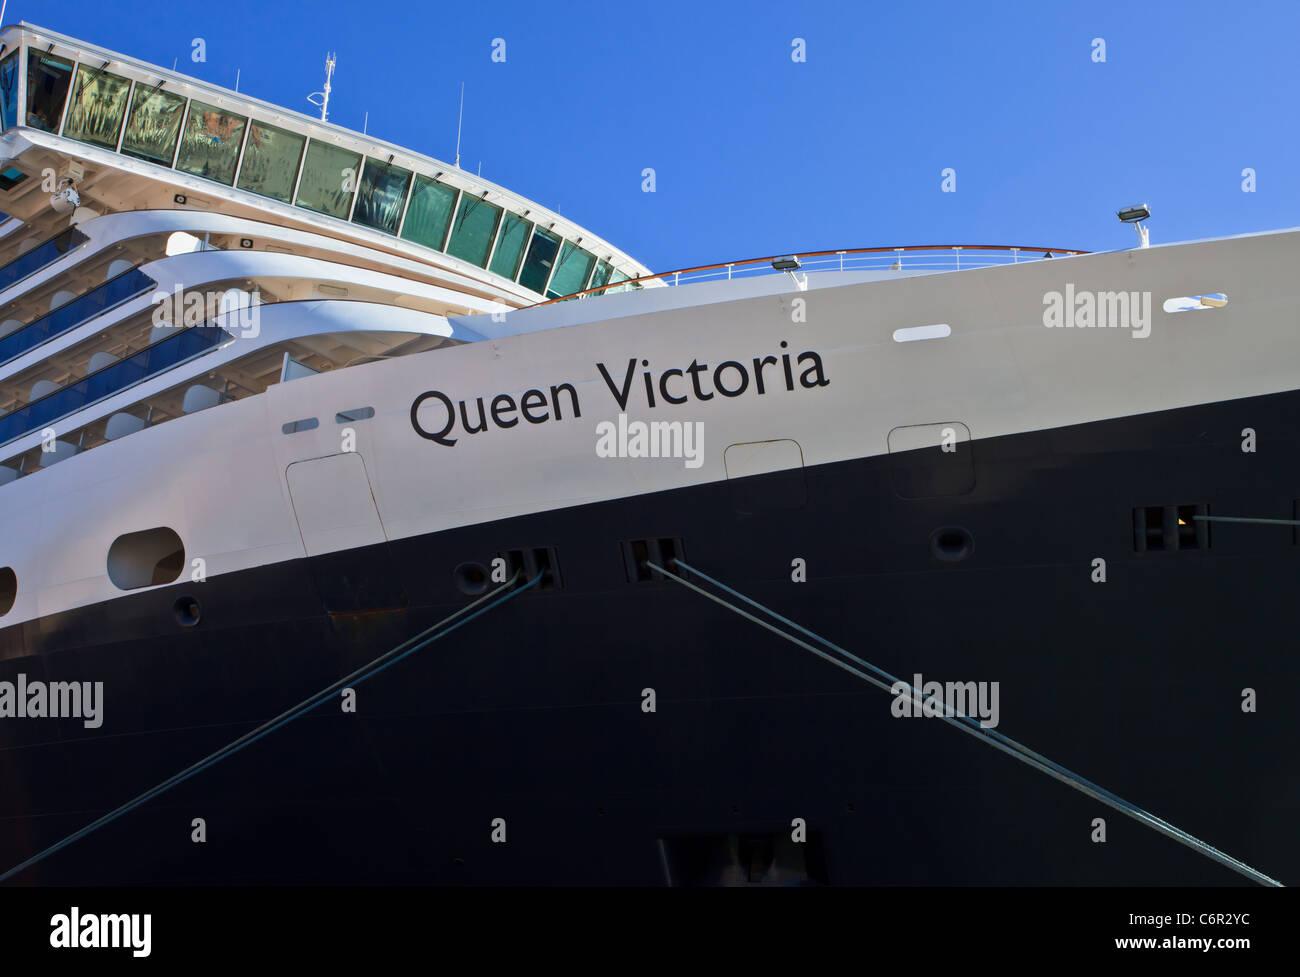 Cruise liner Queen Victoria at Venice harbor, Veneto, Italy - Stock Image